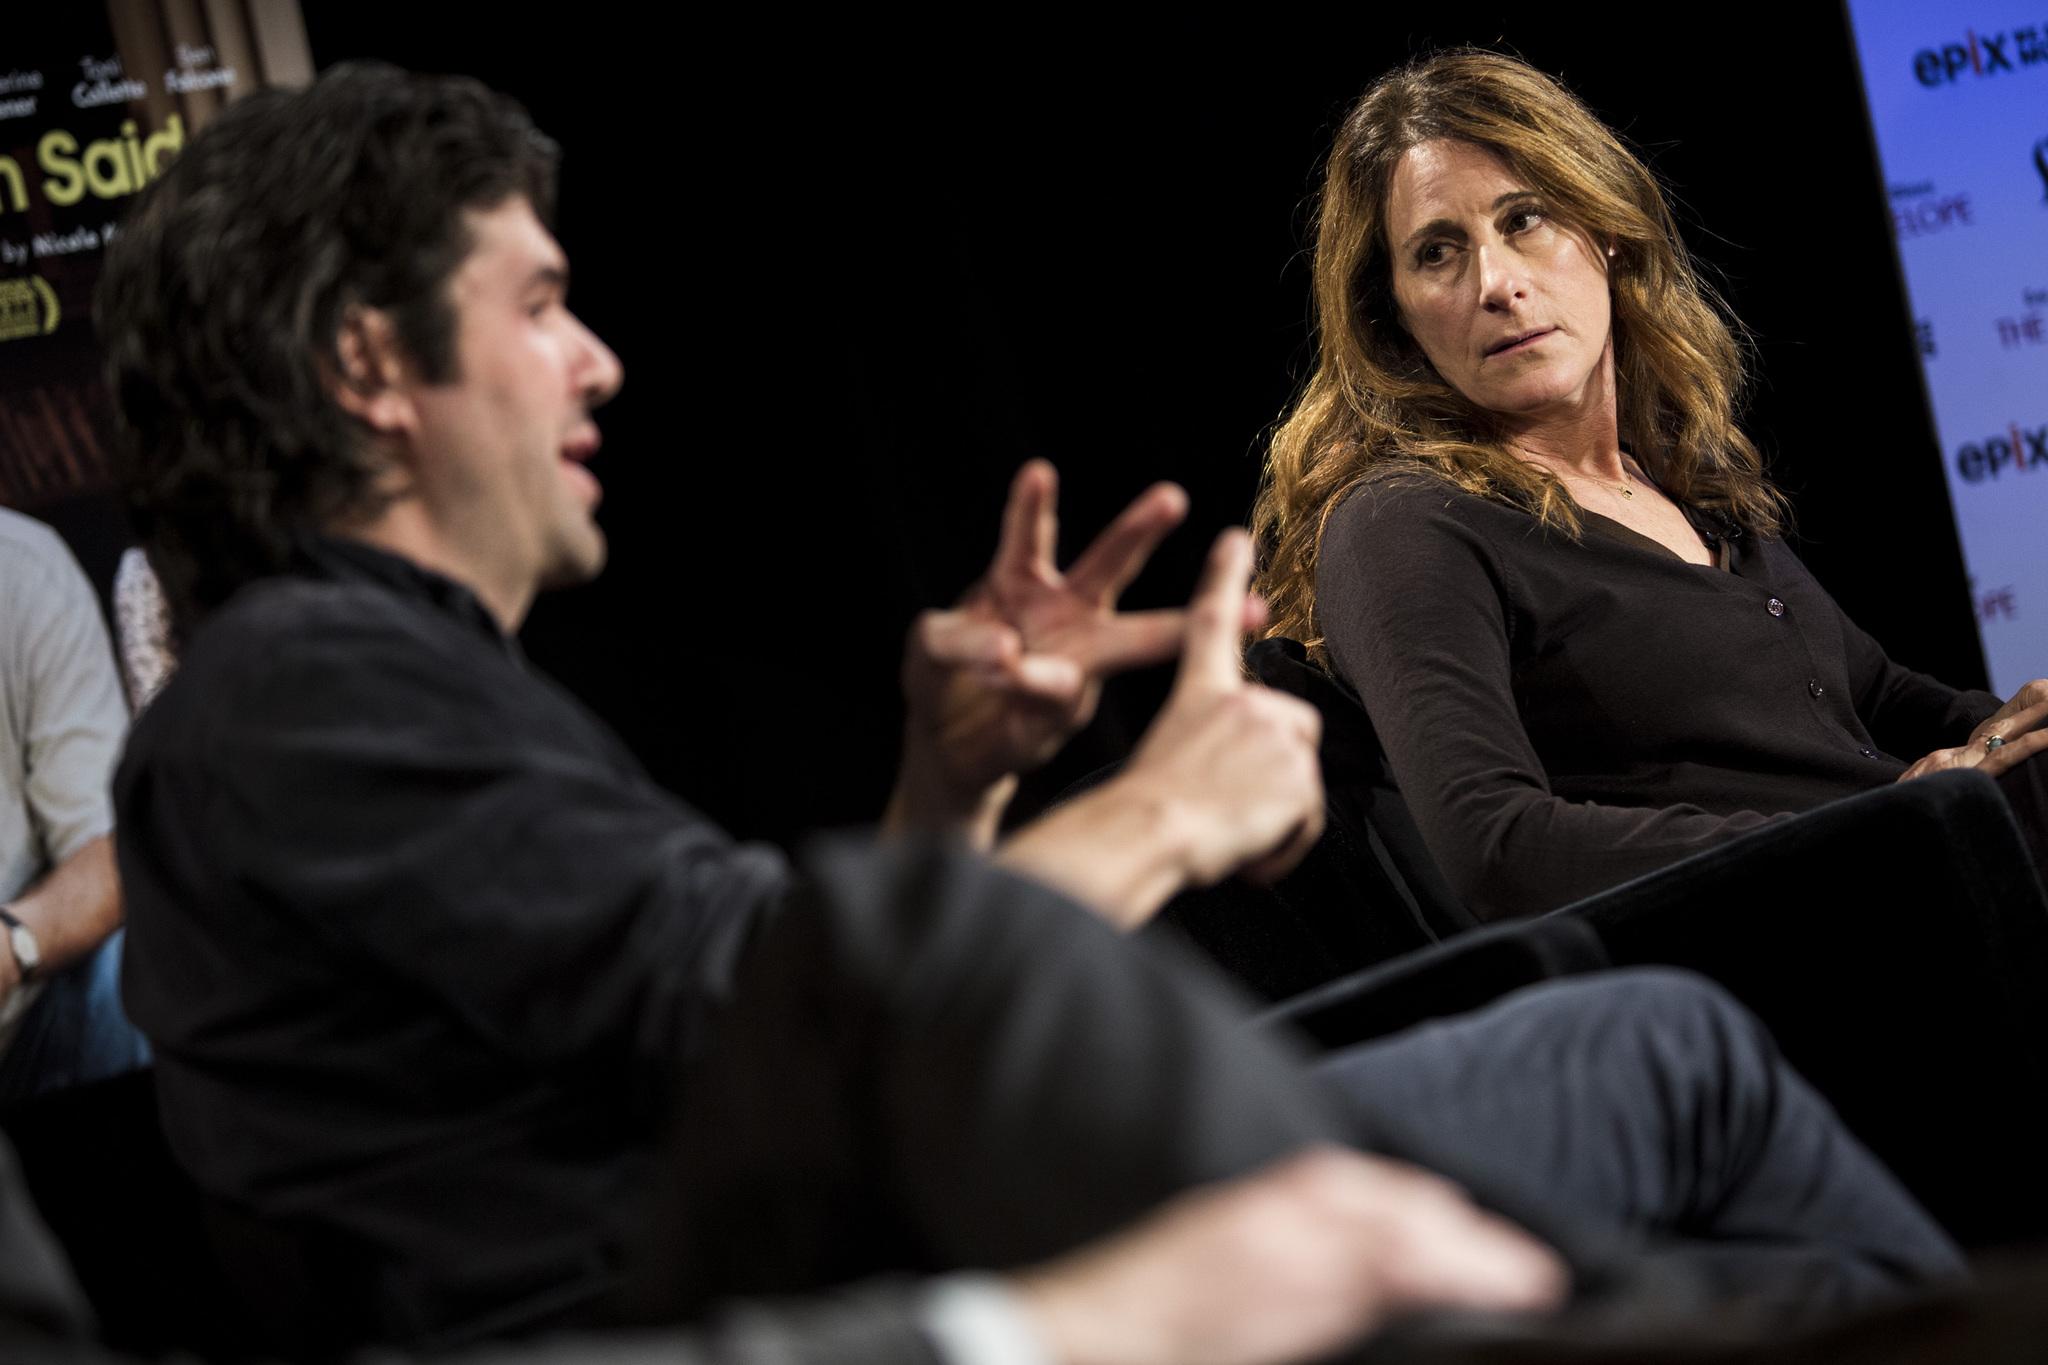 Nicole Holofcener and J.C. Chandor